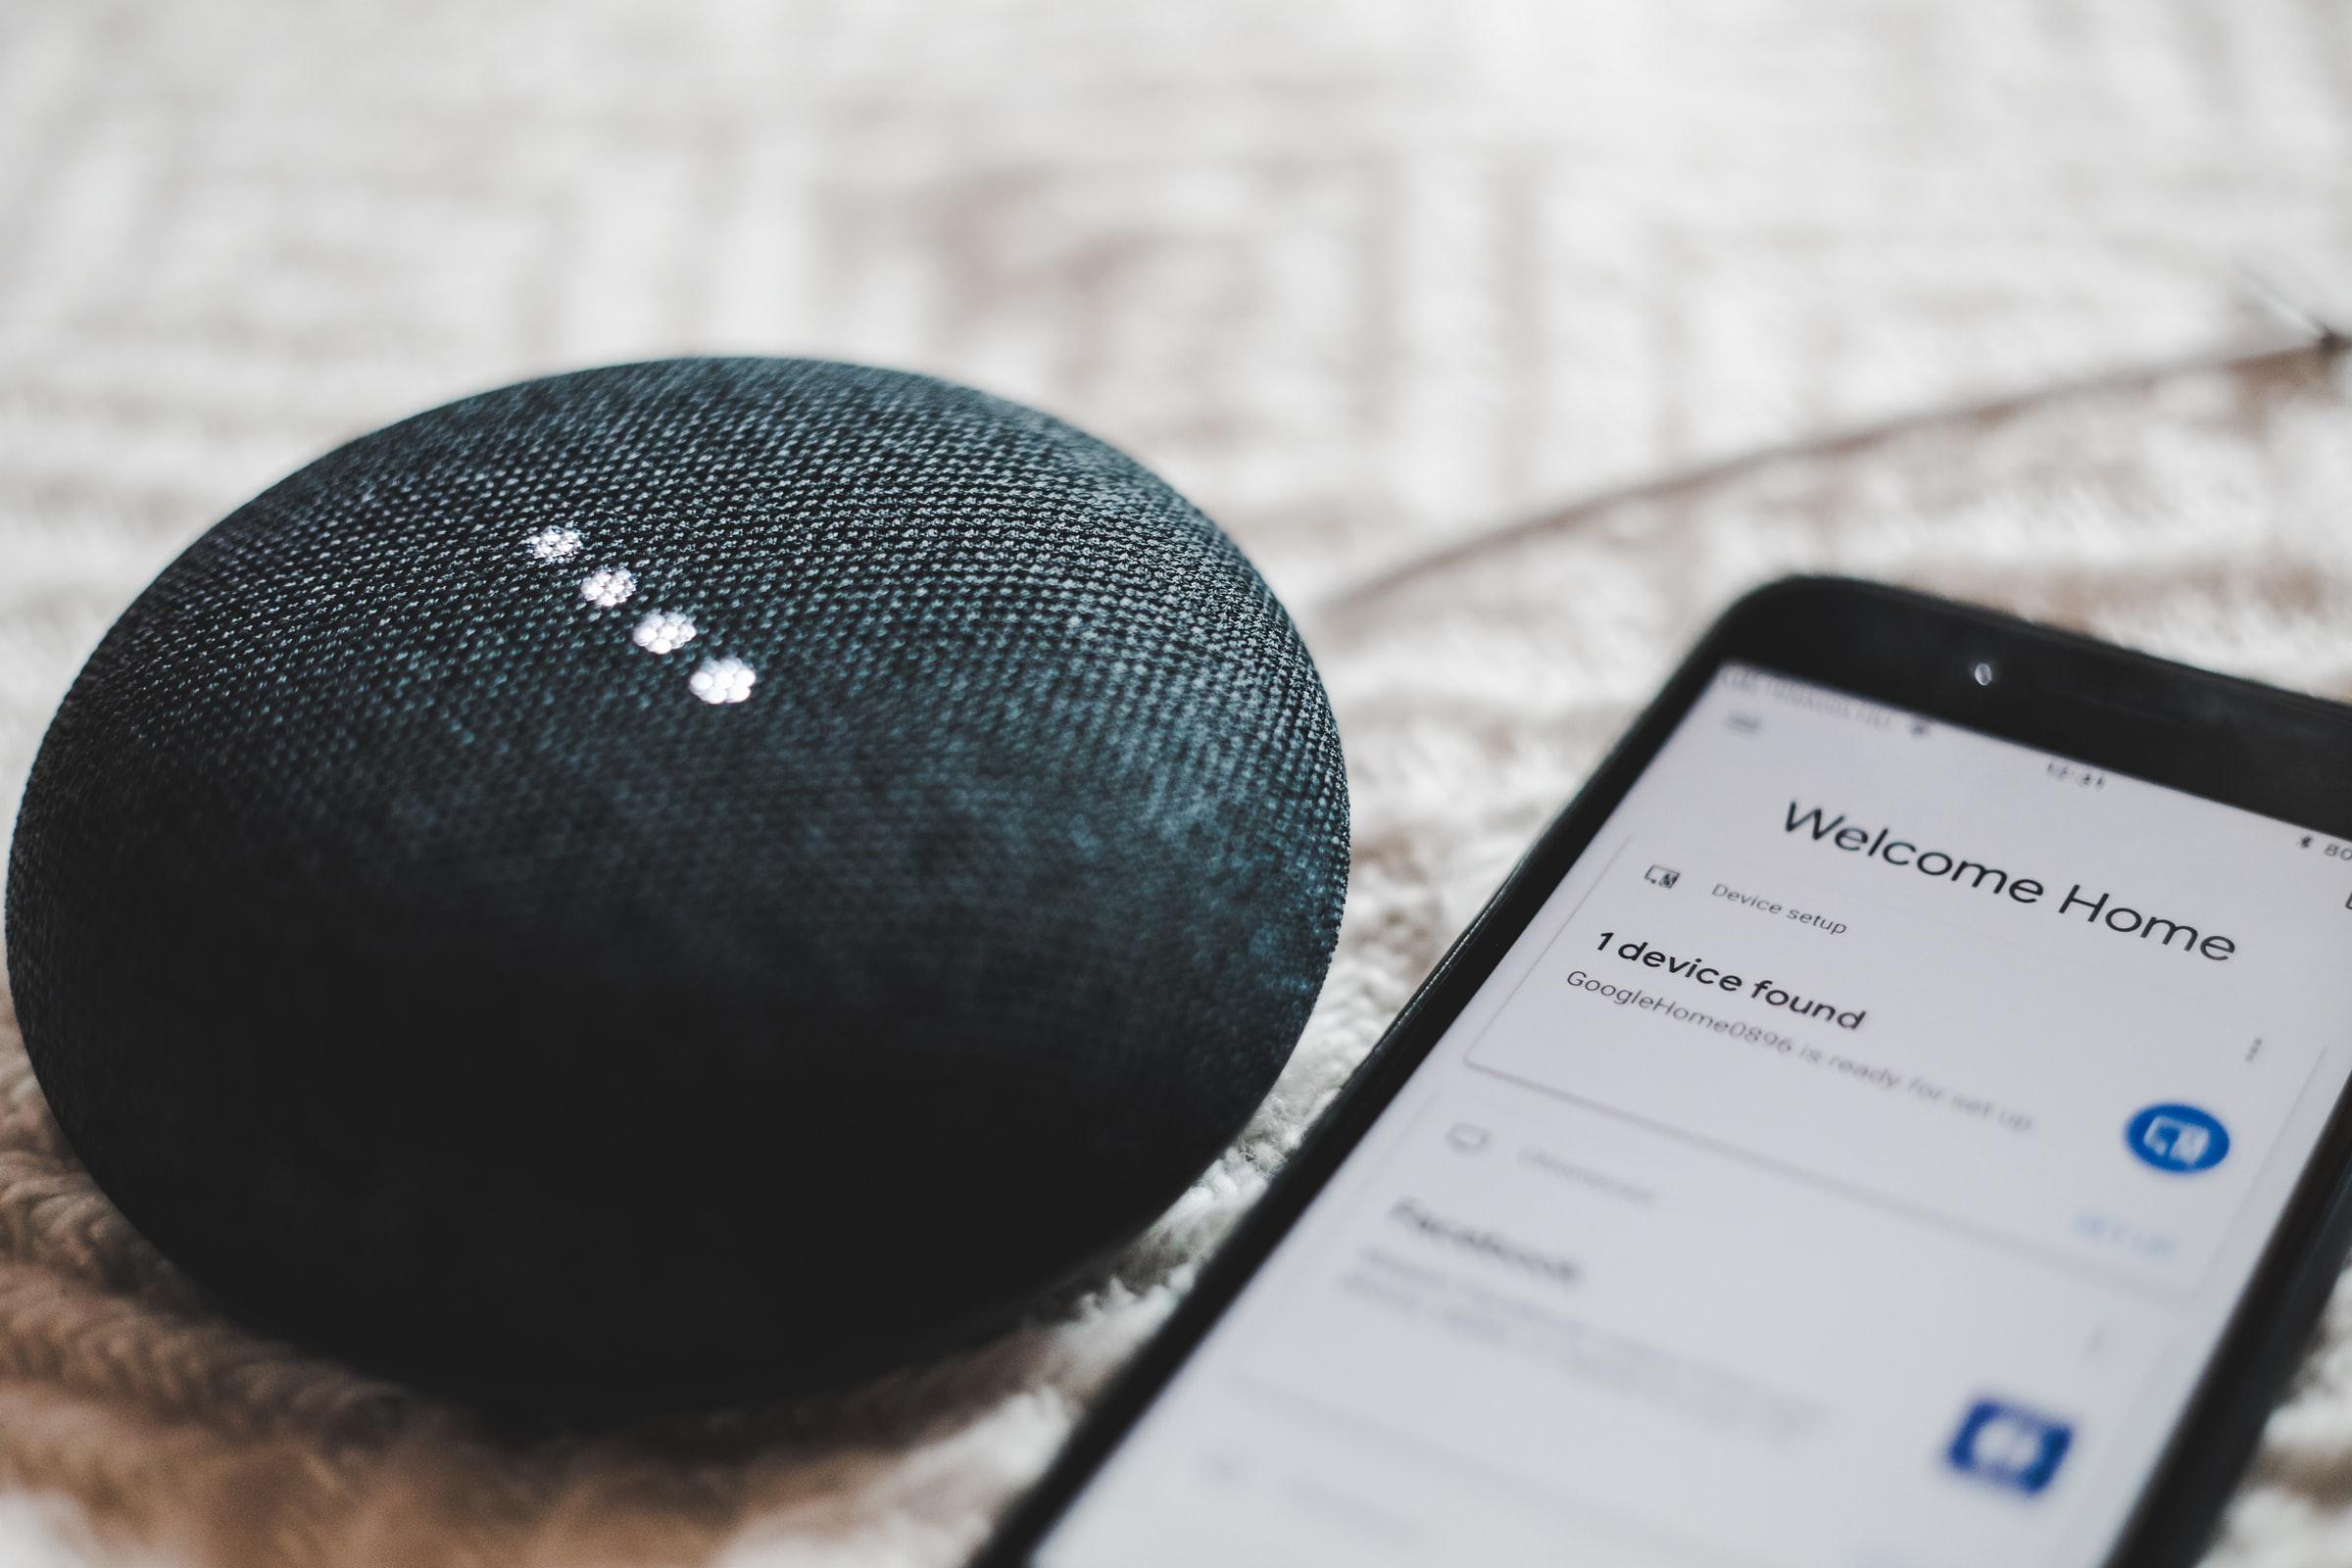 HipoSmart supports Google Assitant